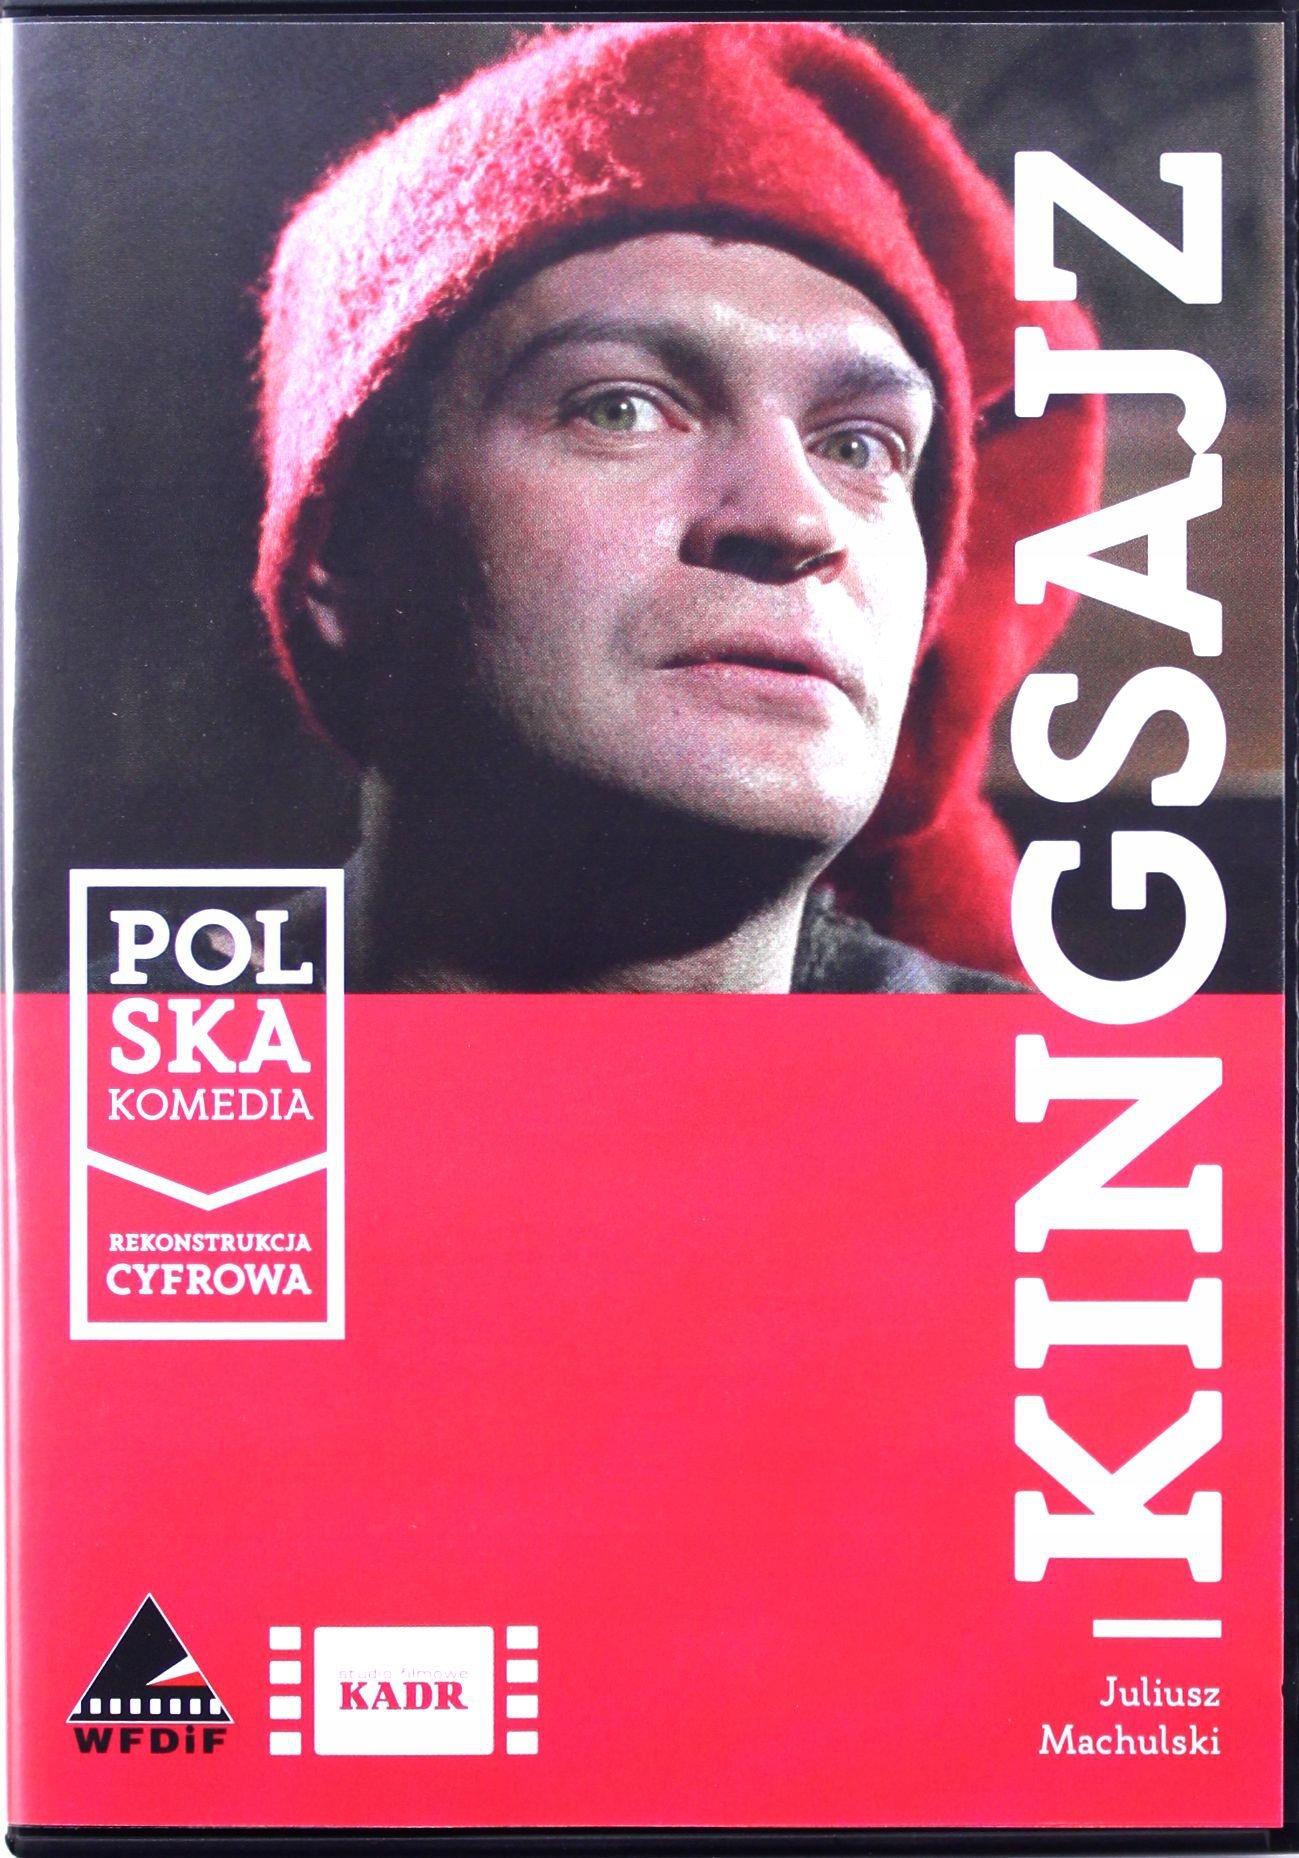 Kingsajz (rekonstrukcja Cyfrowa) [DVD]